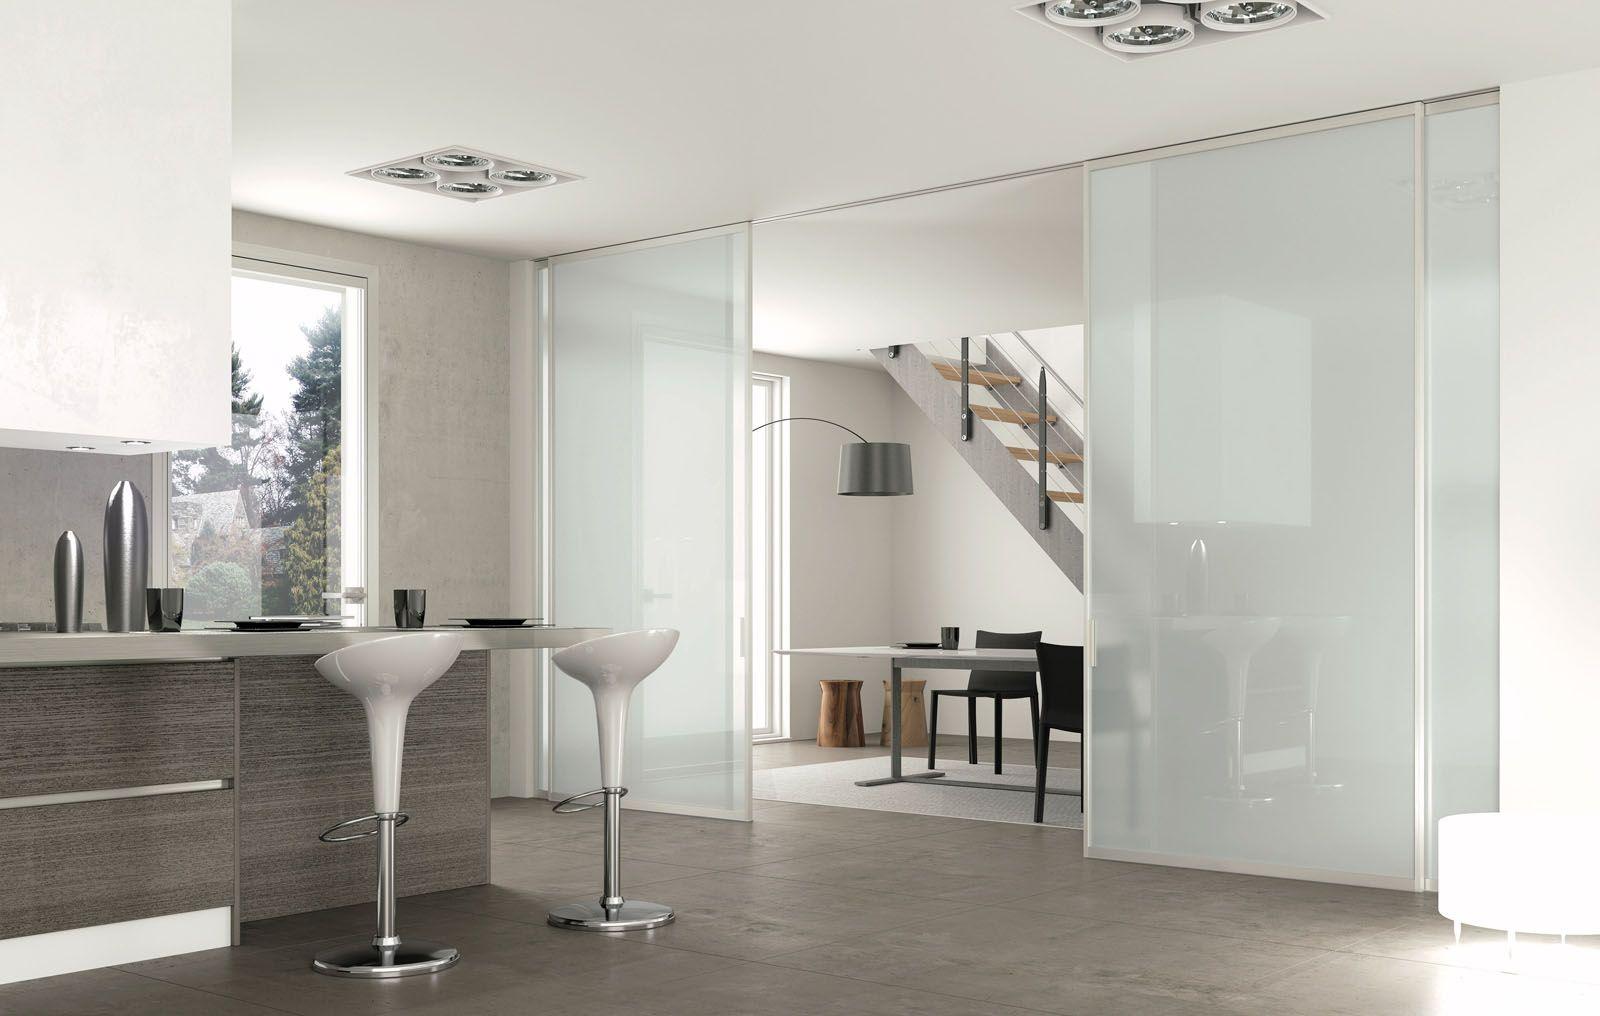 Pareti Di Vetro Scorrevoli : Kitchen ideas for my home porte porte scorrevoli